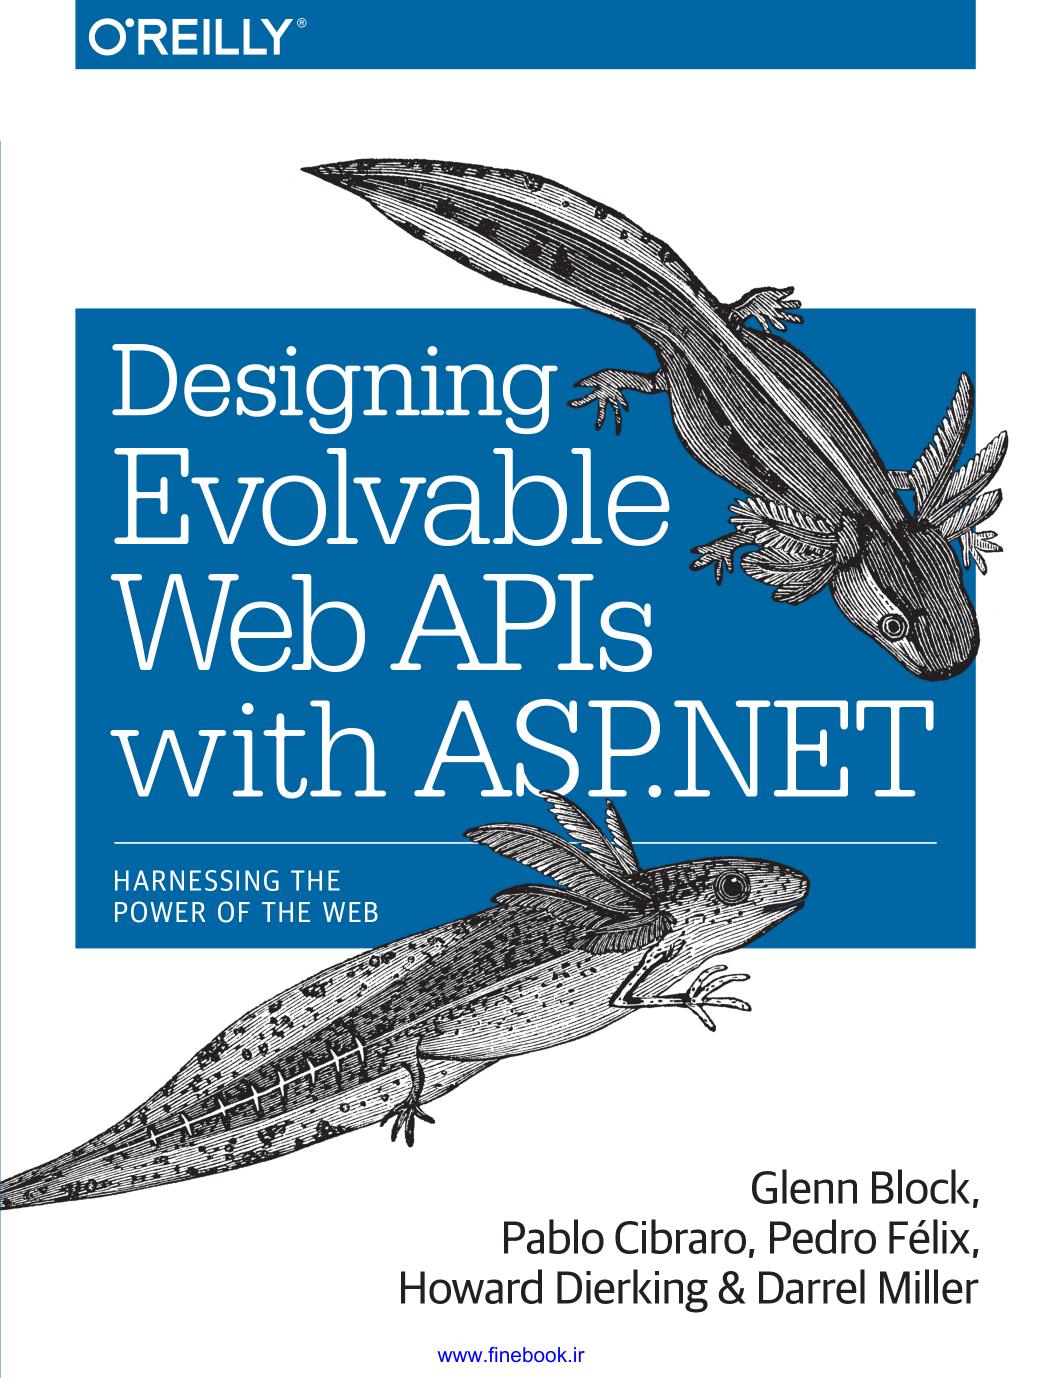 Designing Evolvable Web APIs with ASP NET | manualzz com